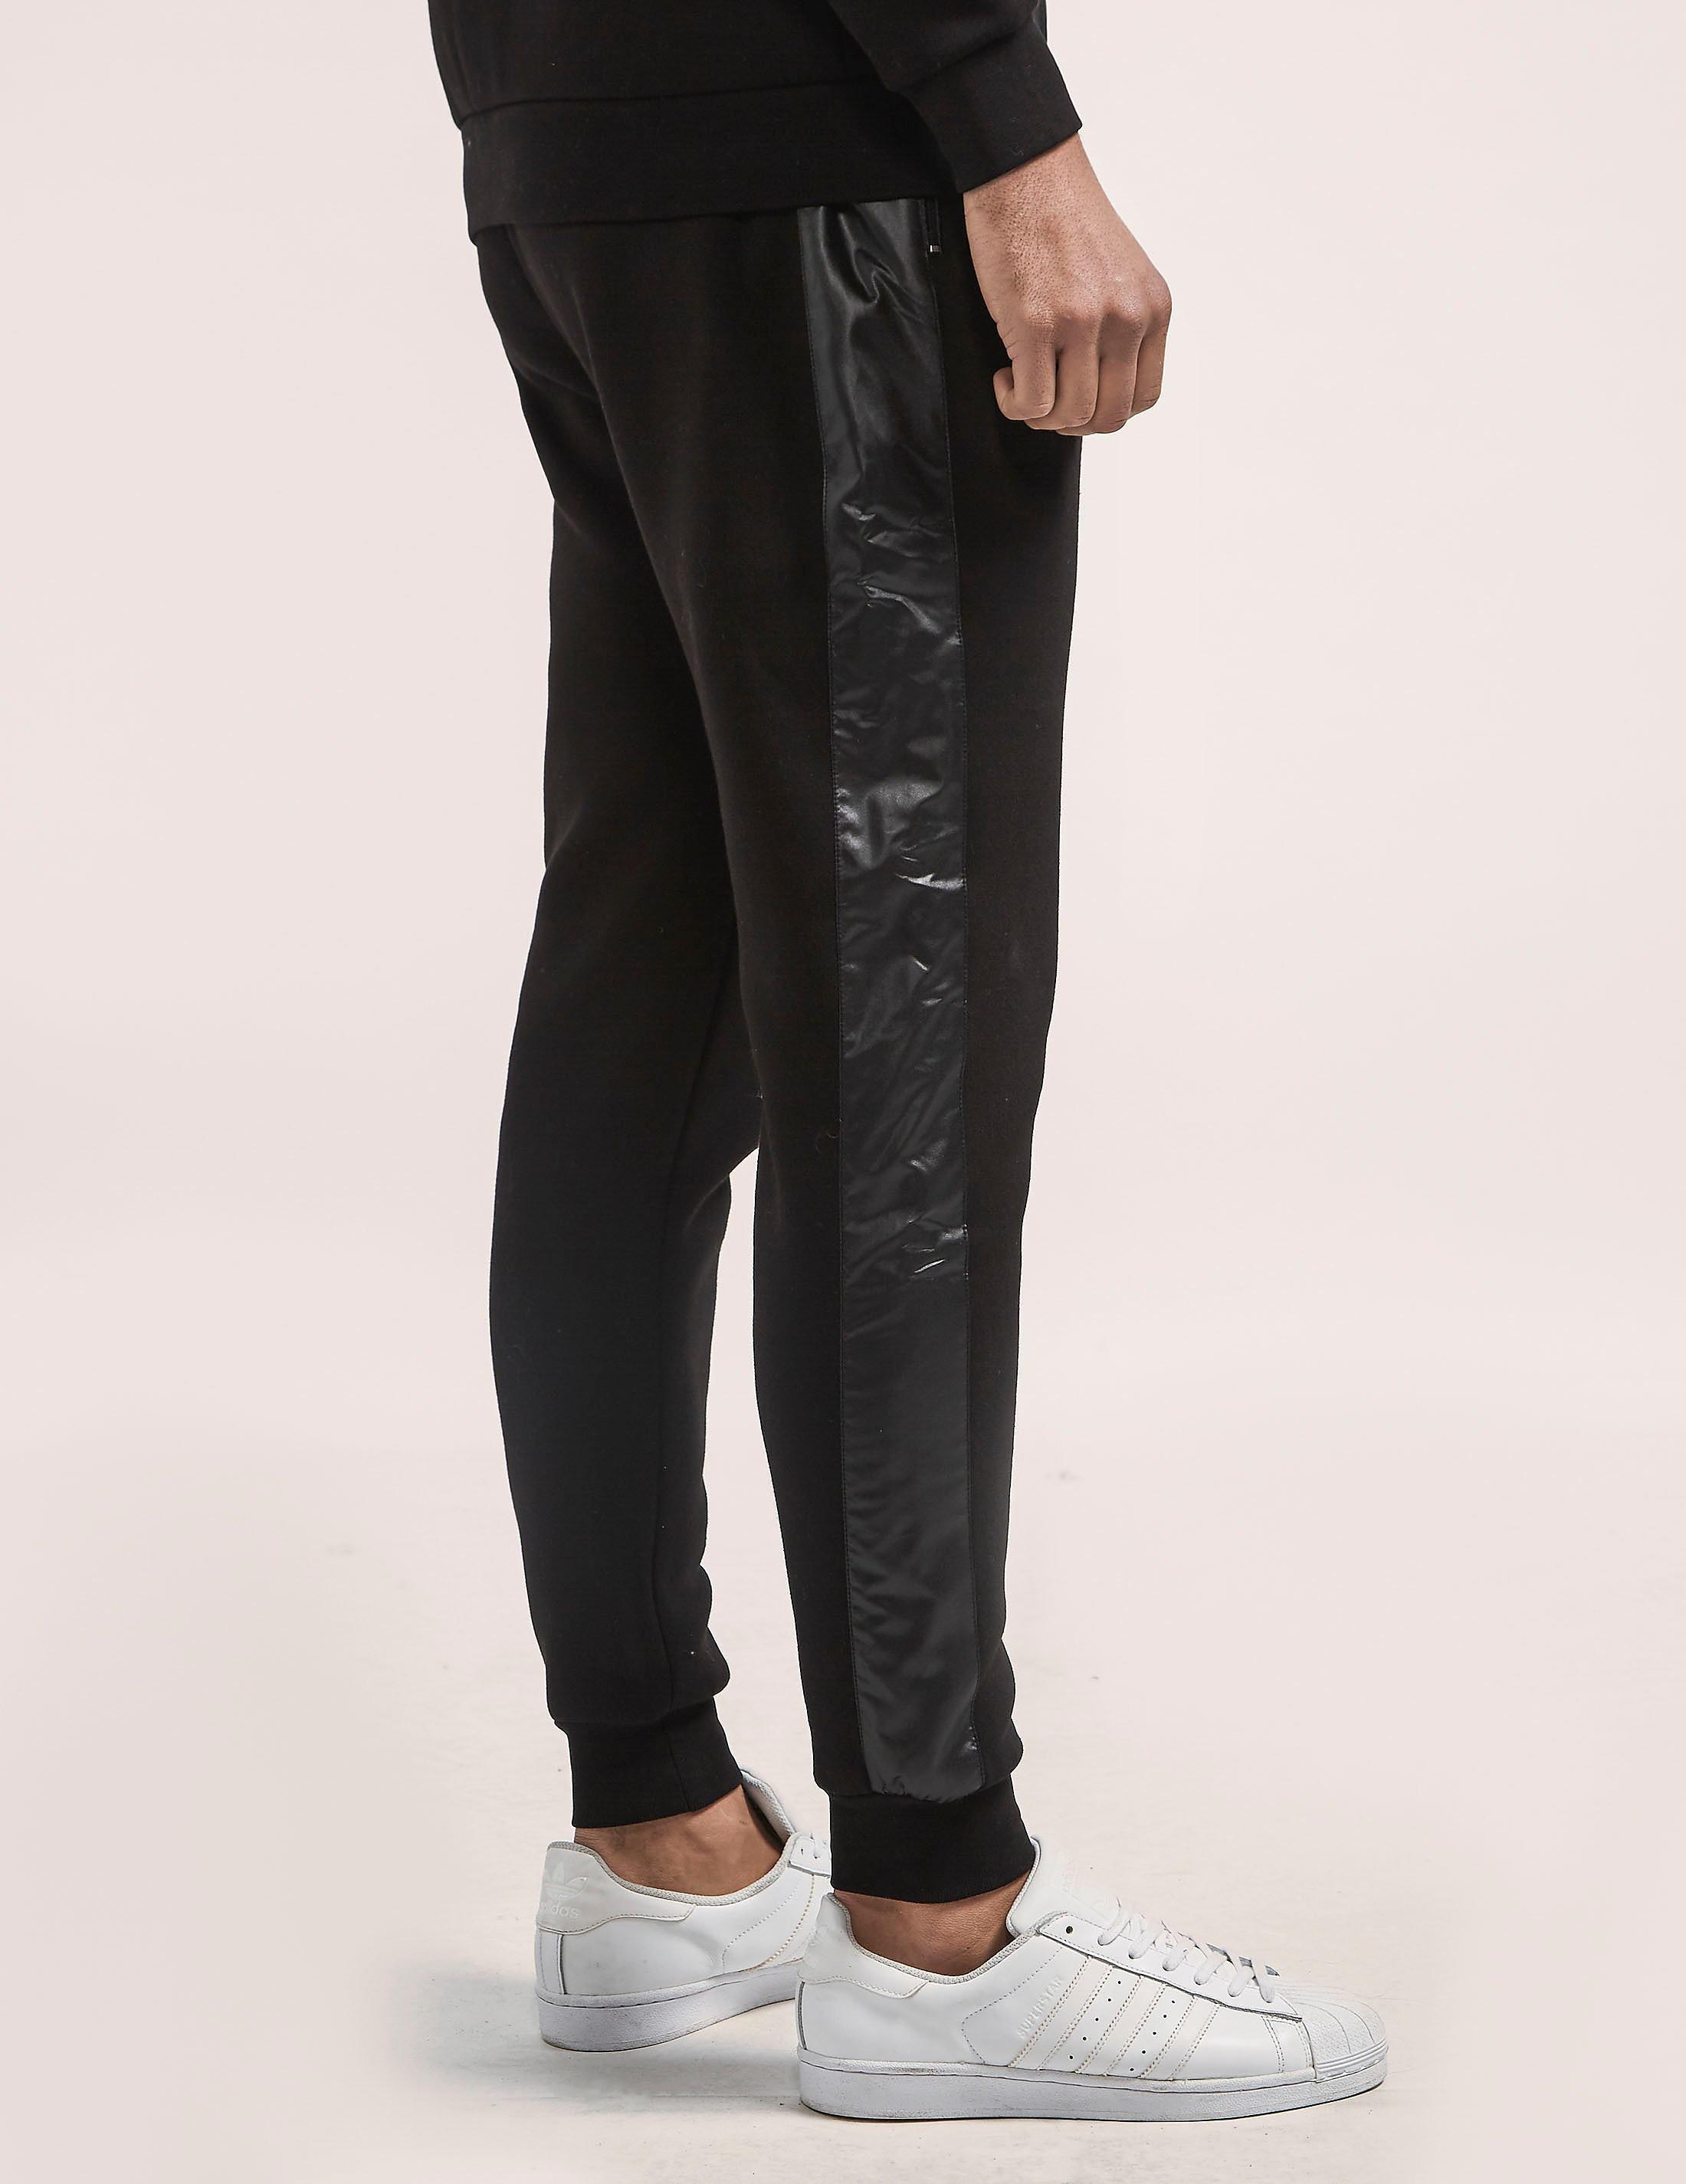 Intense Clothing Sandi Nylon Track Pants